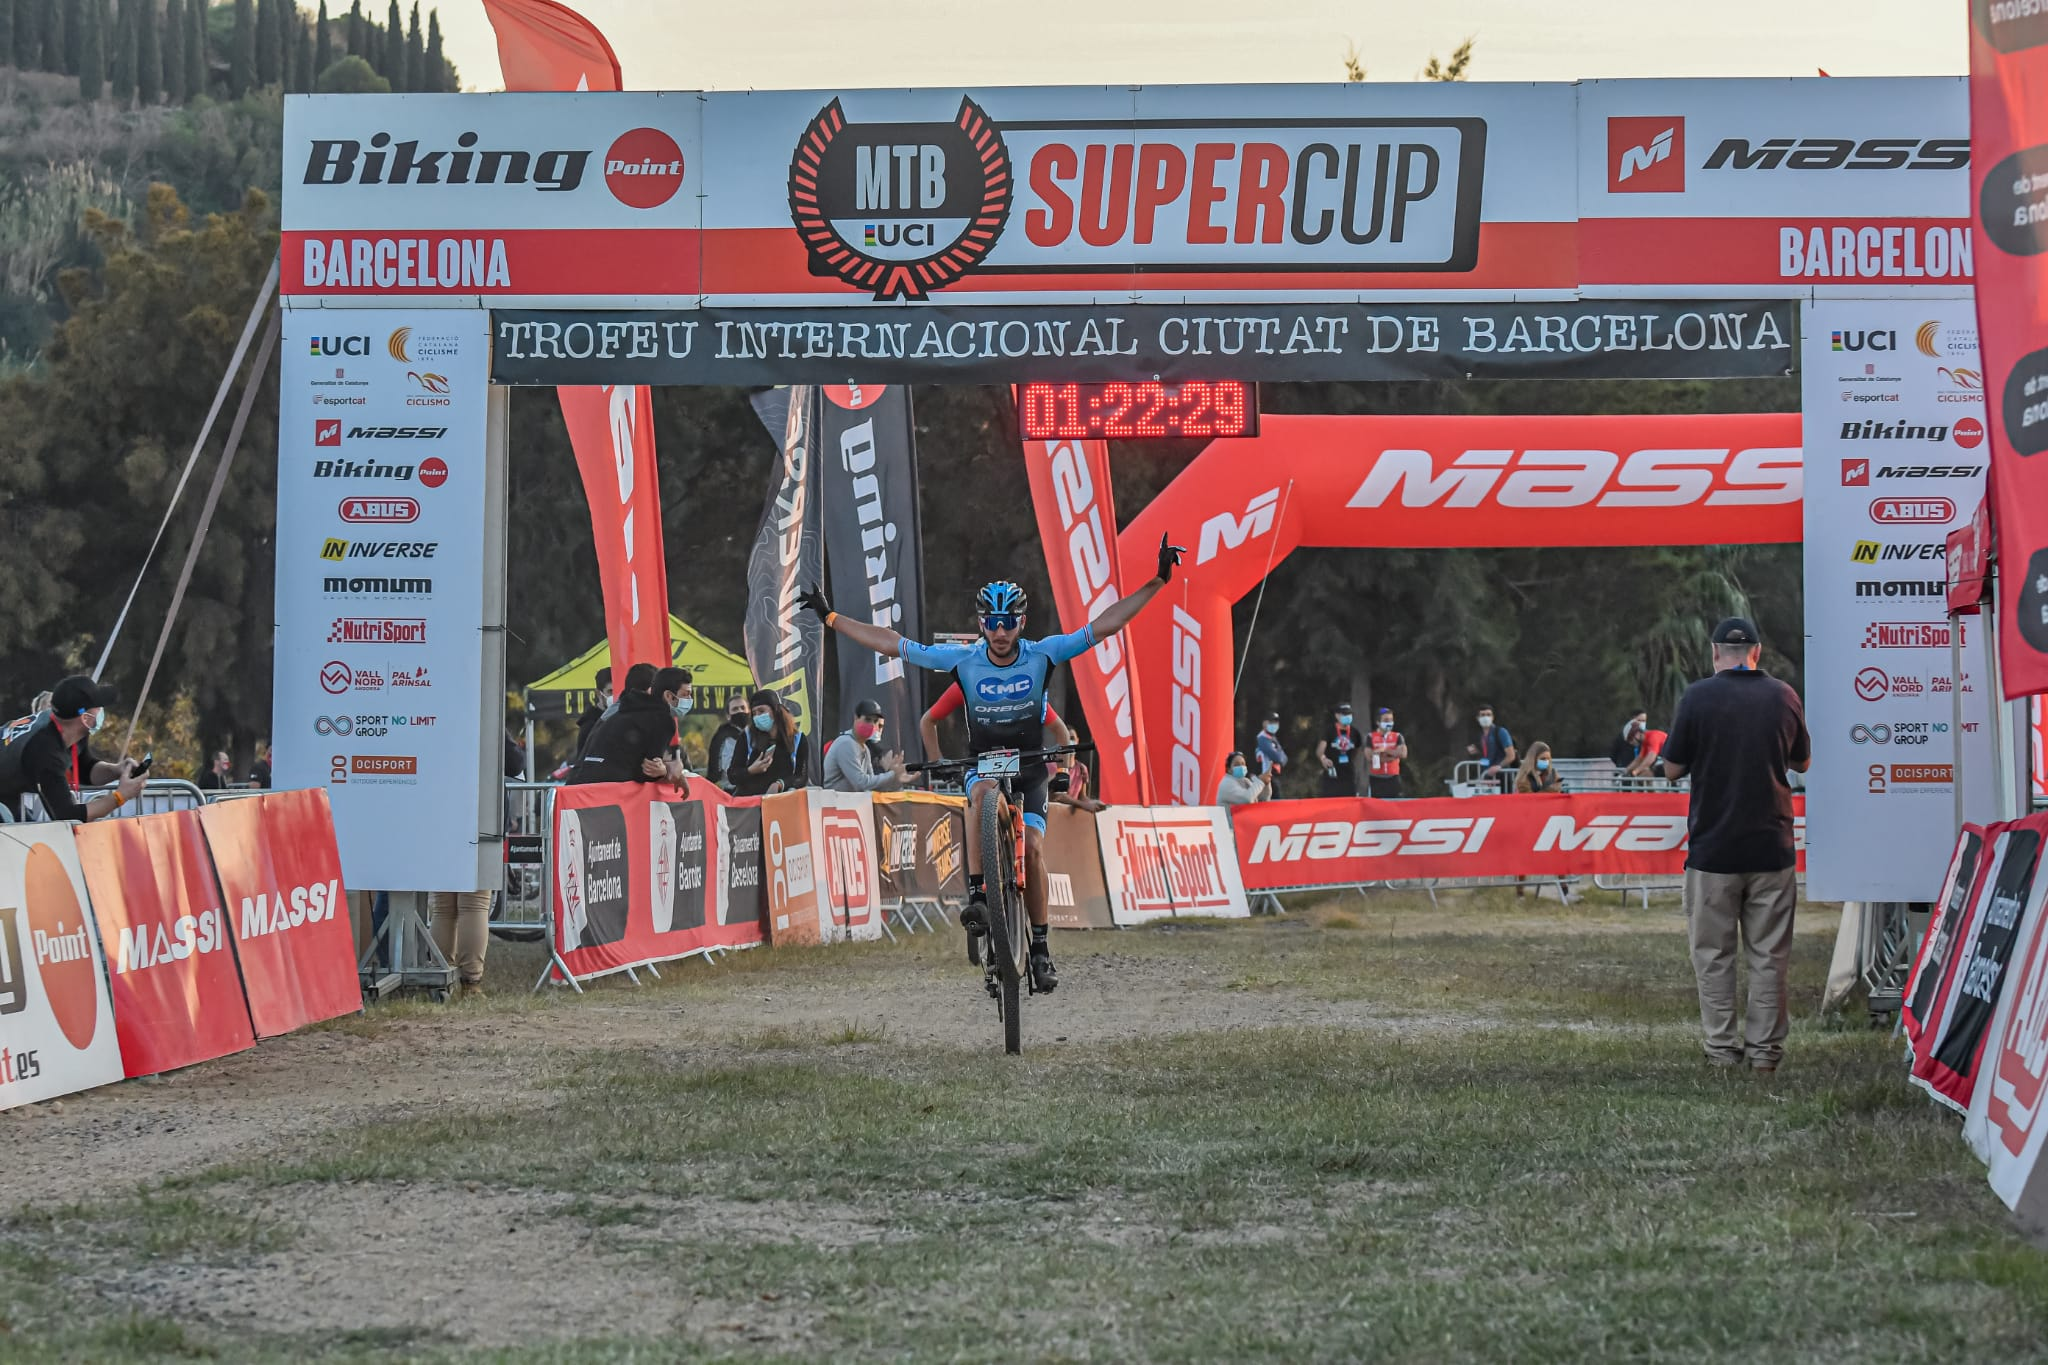 Bosque y Figueras triunfan en la Continental Super Cup Massi de Cala Ratjada